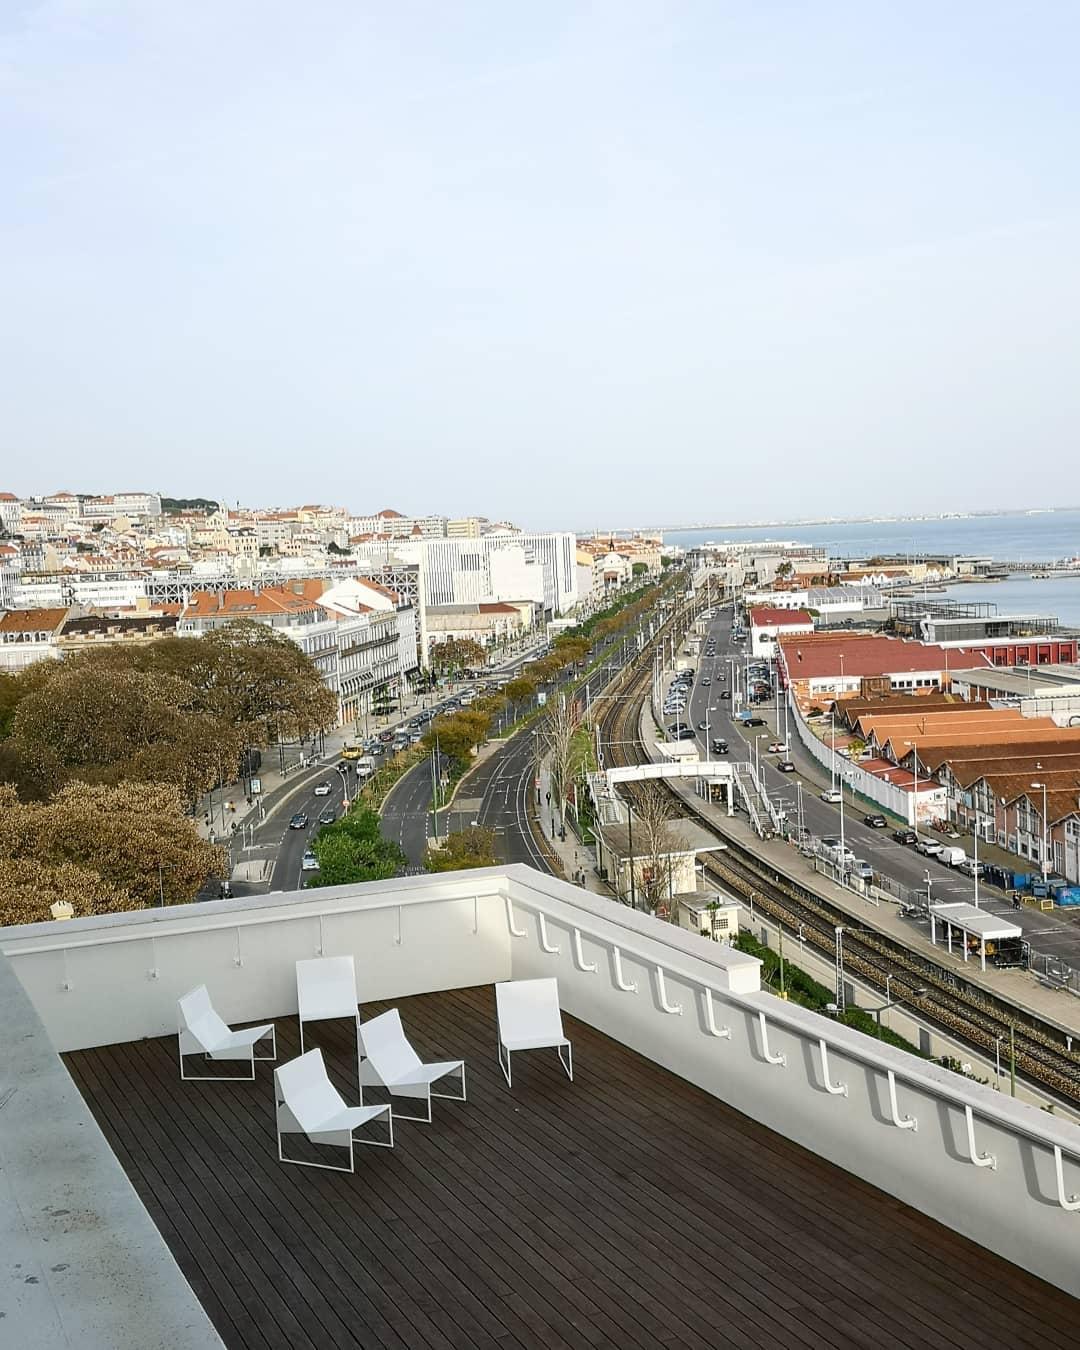 Lisbon seen from WPP